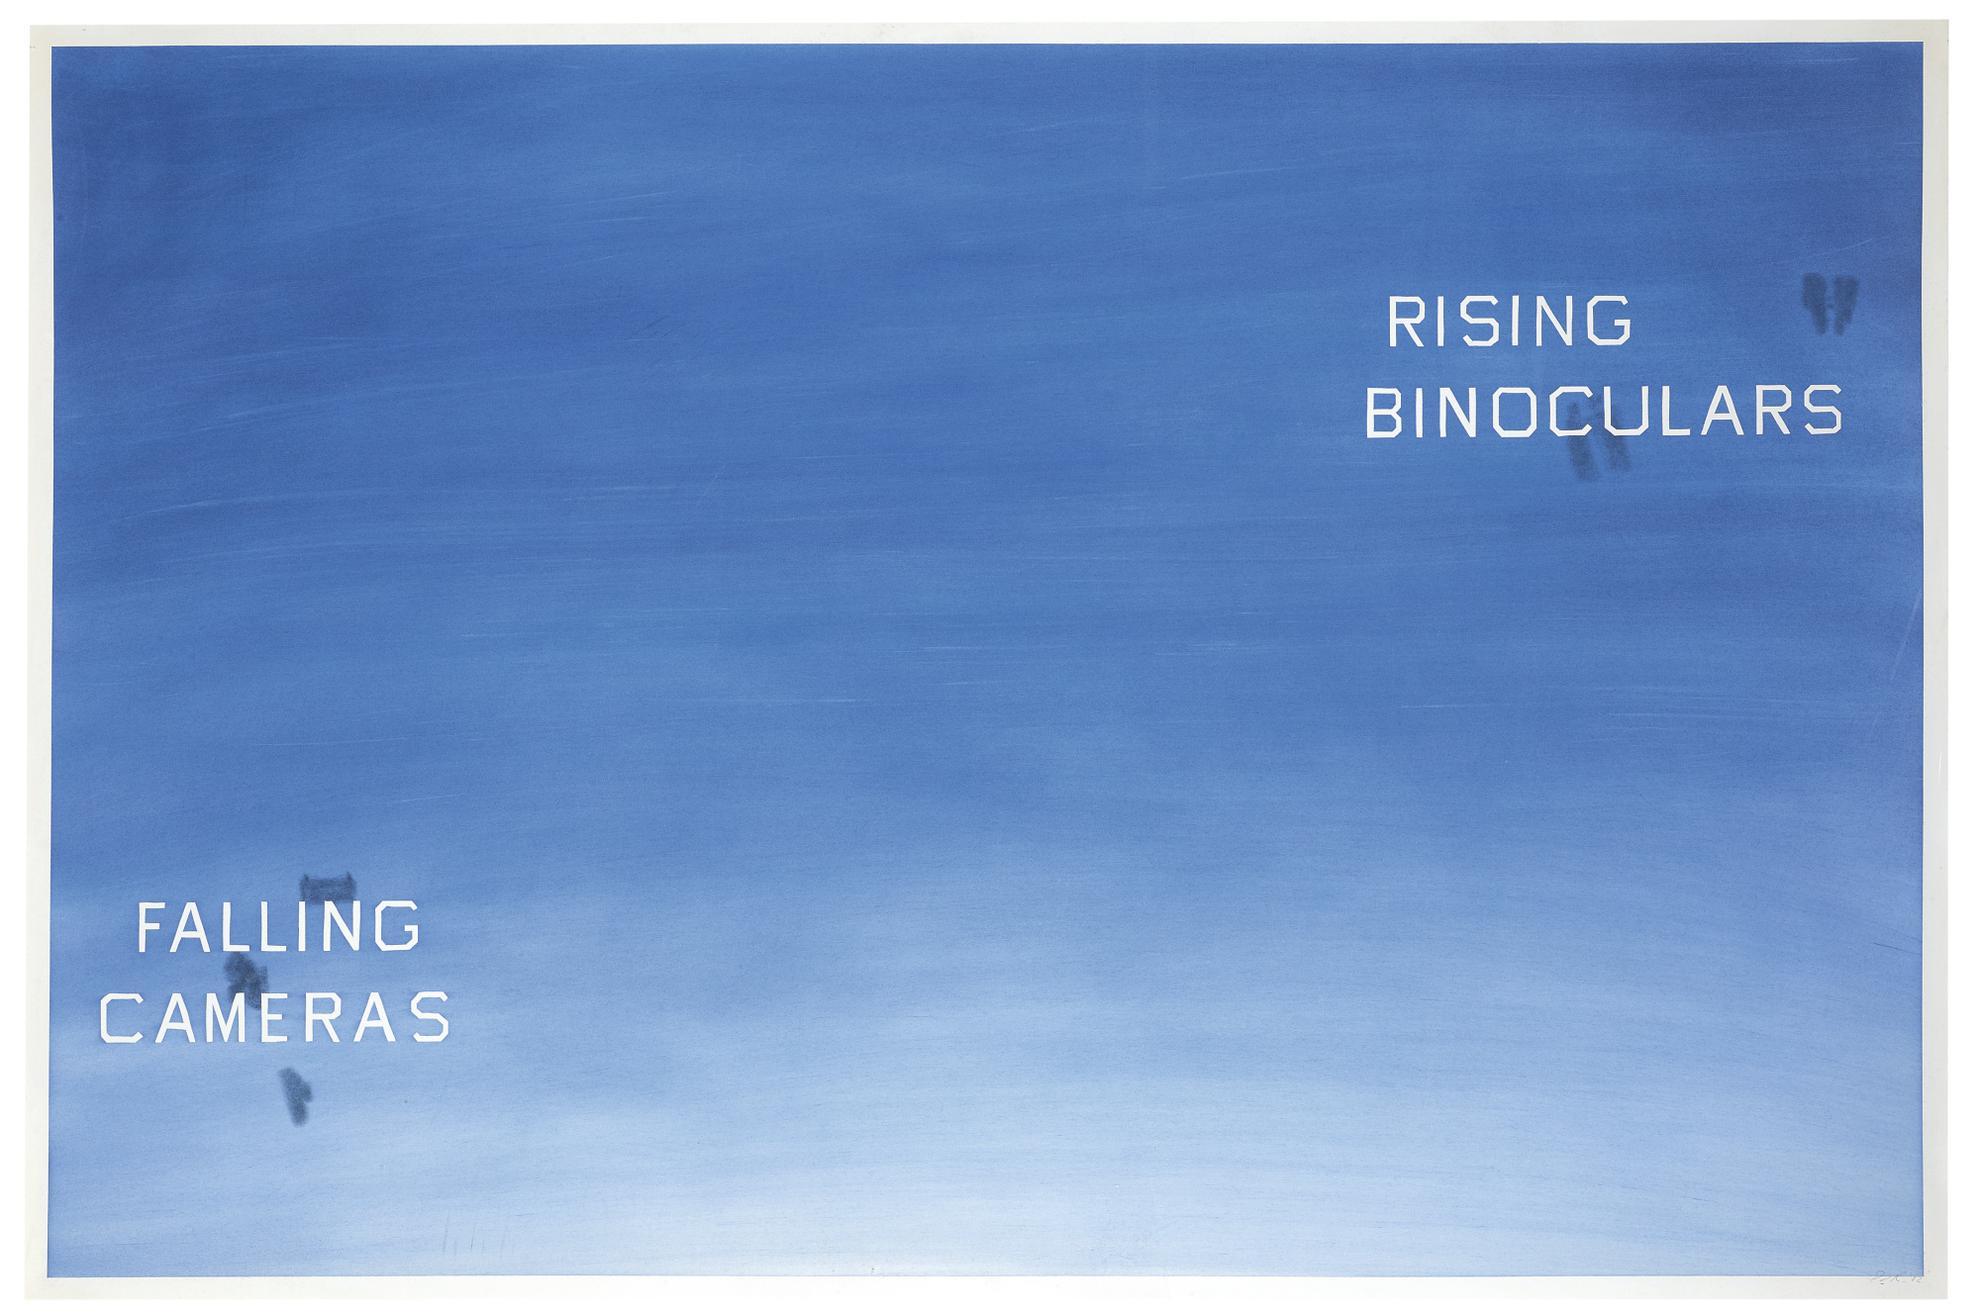 Ed Ruscha-Falling Cameras; Rising Binoculars-1982